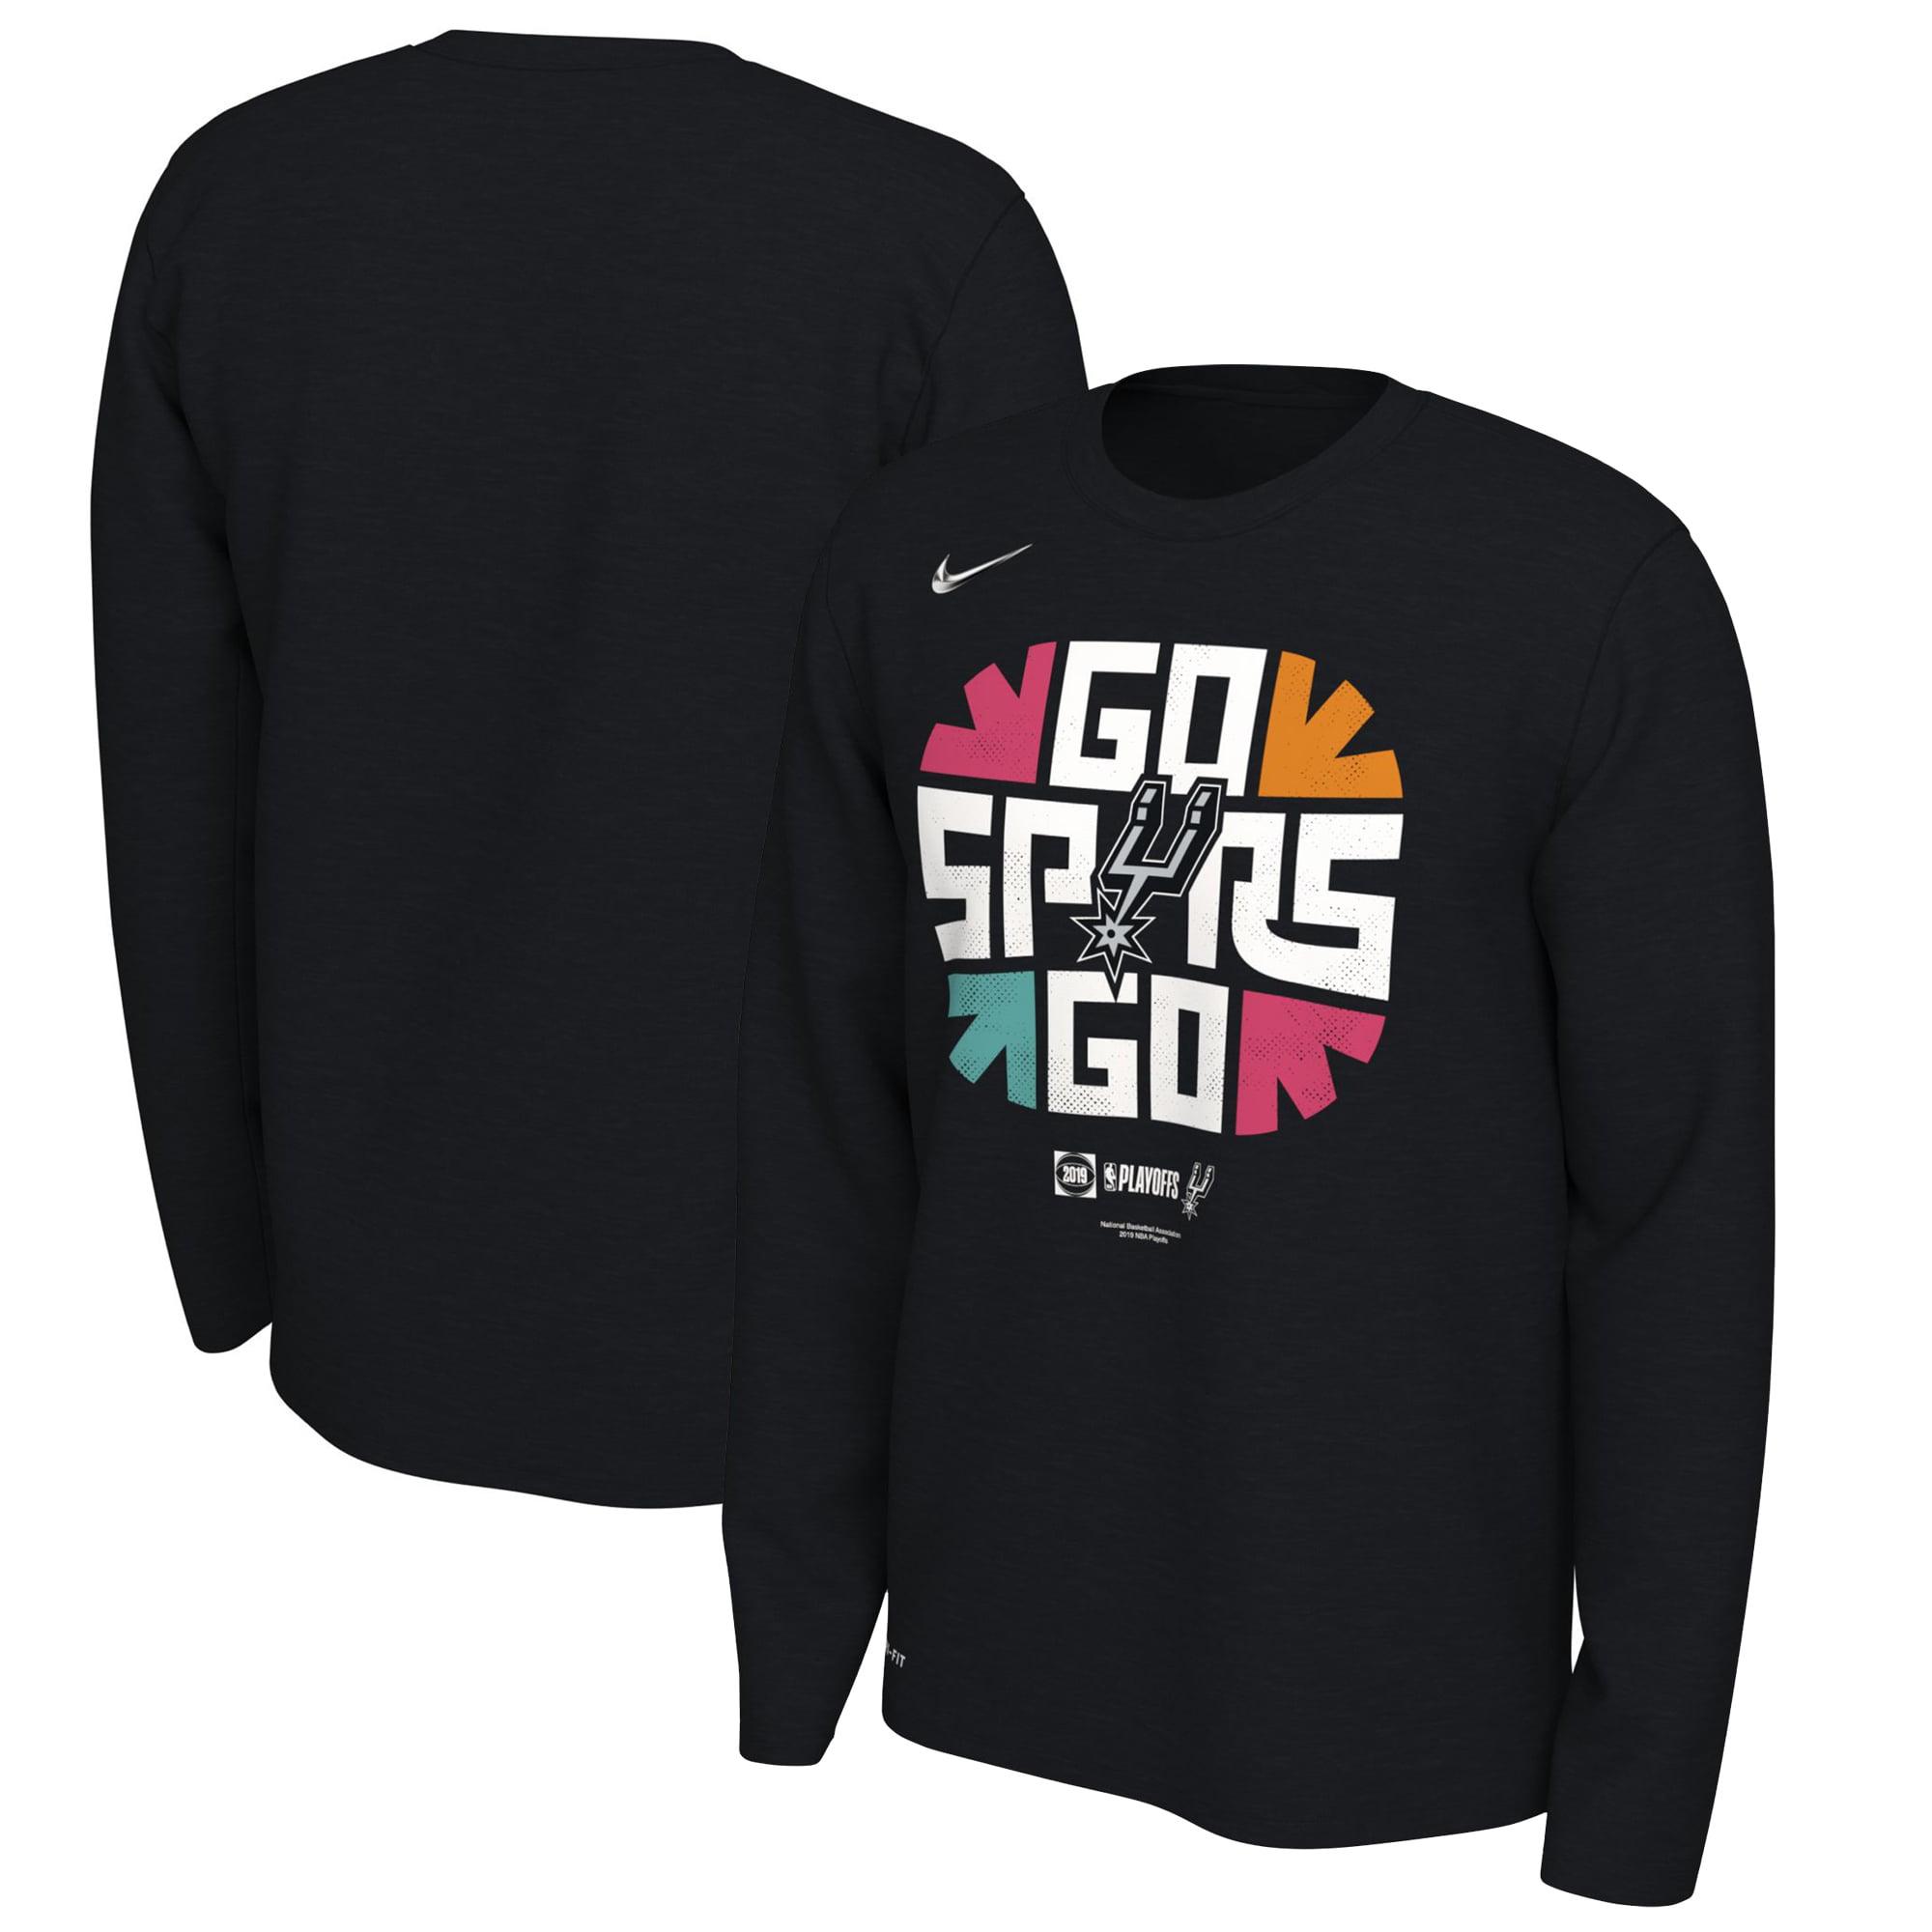 San Antonio Spurs Nike 2019 NBA Playoffs Bound Team Mantra Dri-FIT Long Sleeve T-Shirt - Black